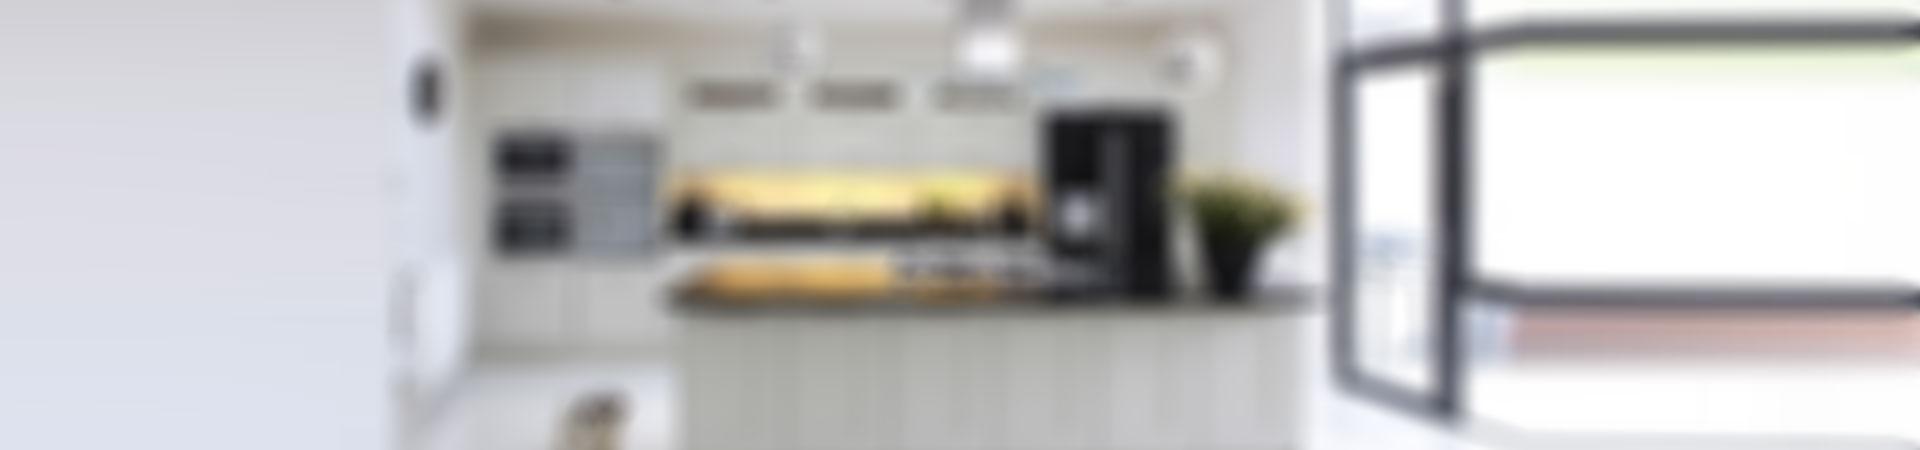 Vidrio templado para electrodomesticos